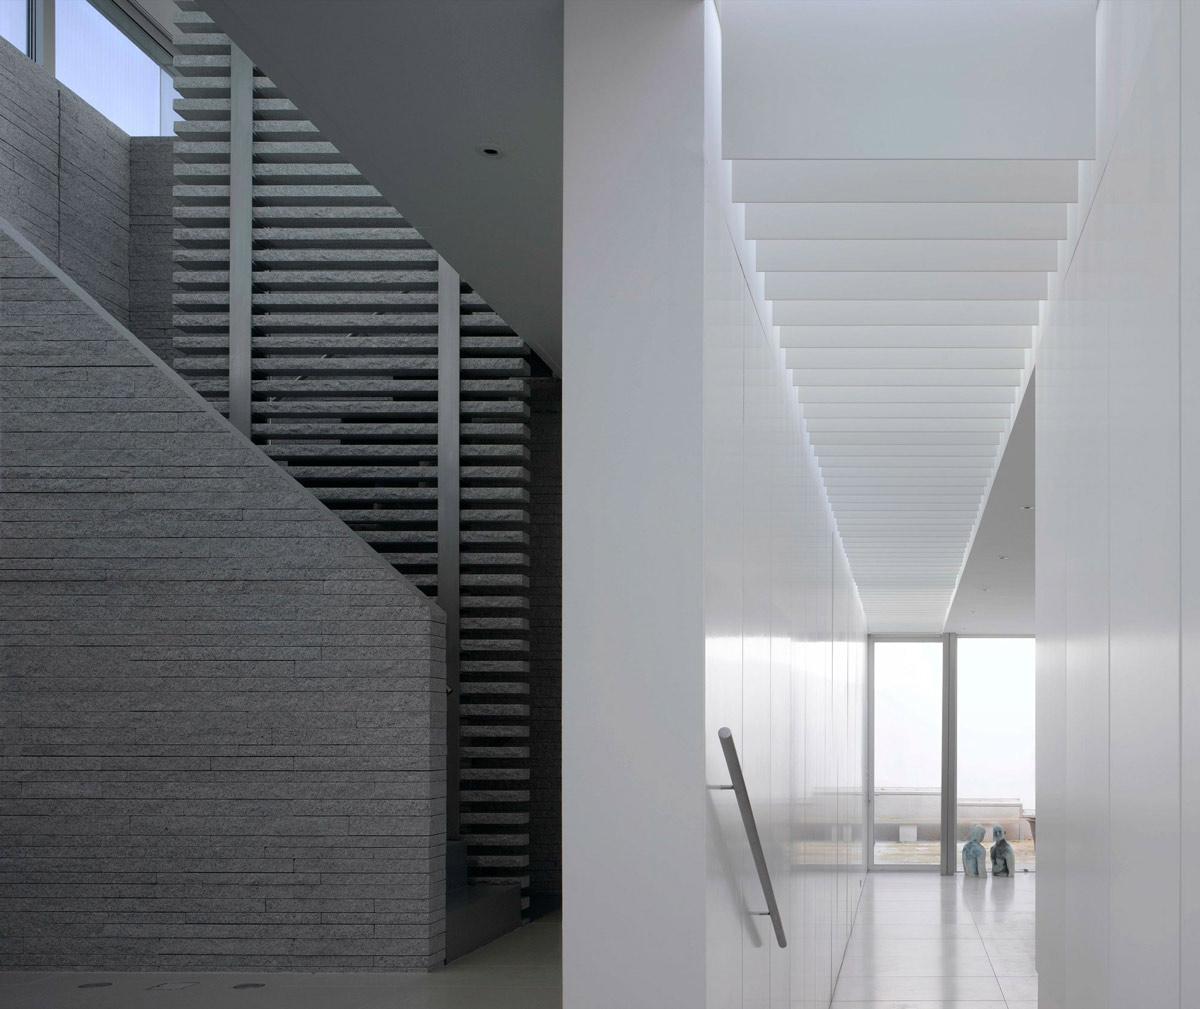 Stairs, Hallway, Burren House in Dublin, Ireland by Níall McLaughlin Architects